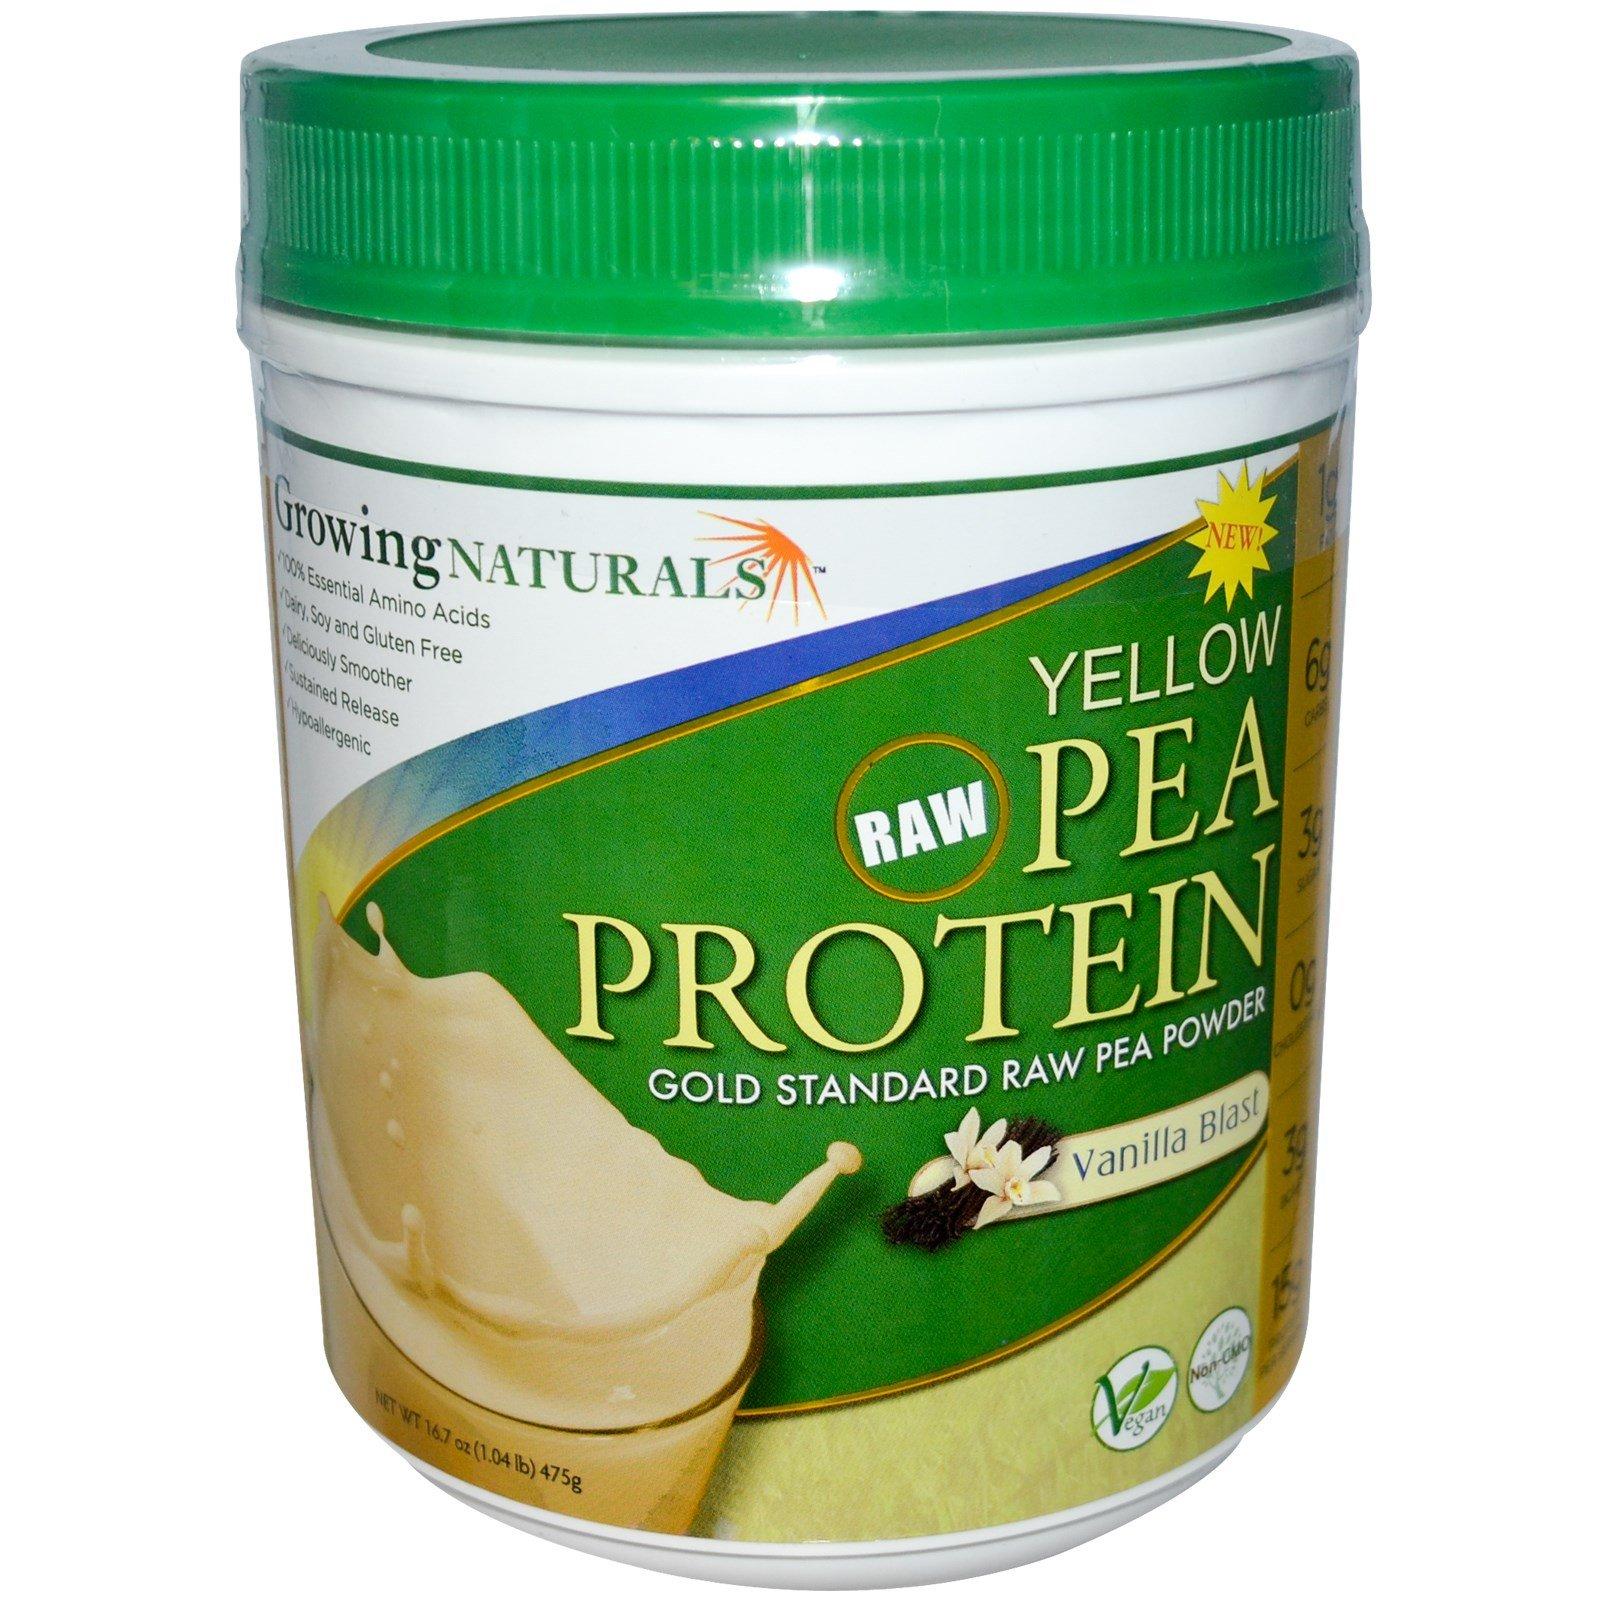 Growing Naturals, Yellow Pea Protein, Vanilla Blast, 16.7 oz (475 g) - 3PC